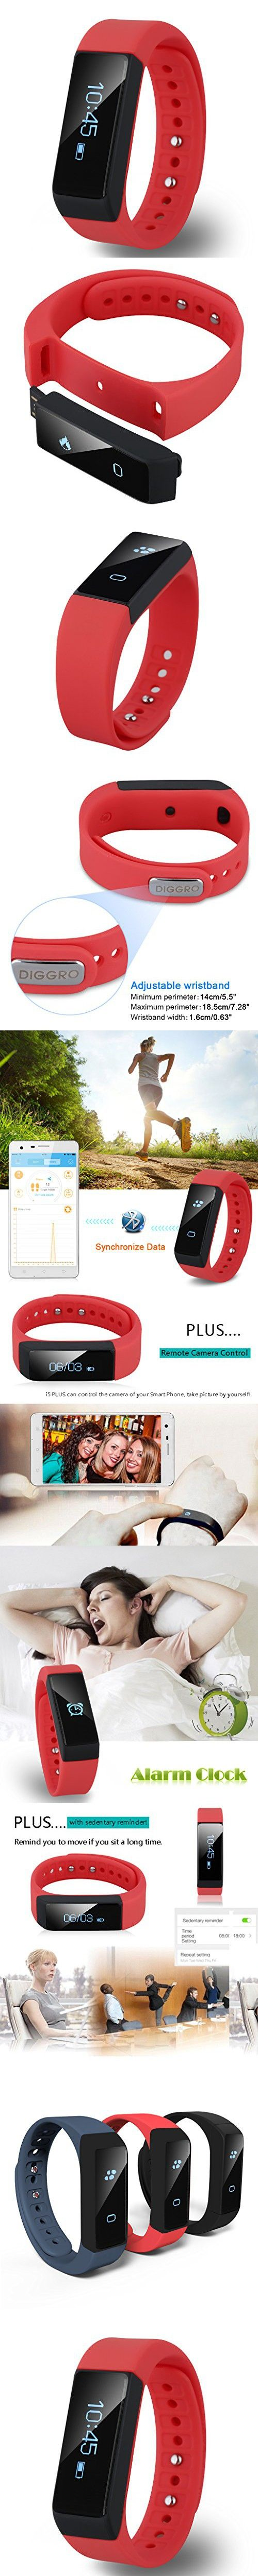 ios calorie tracker app